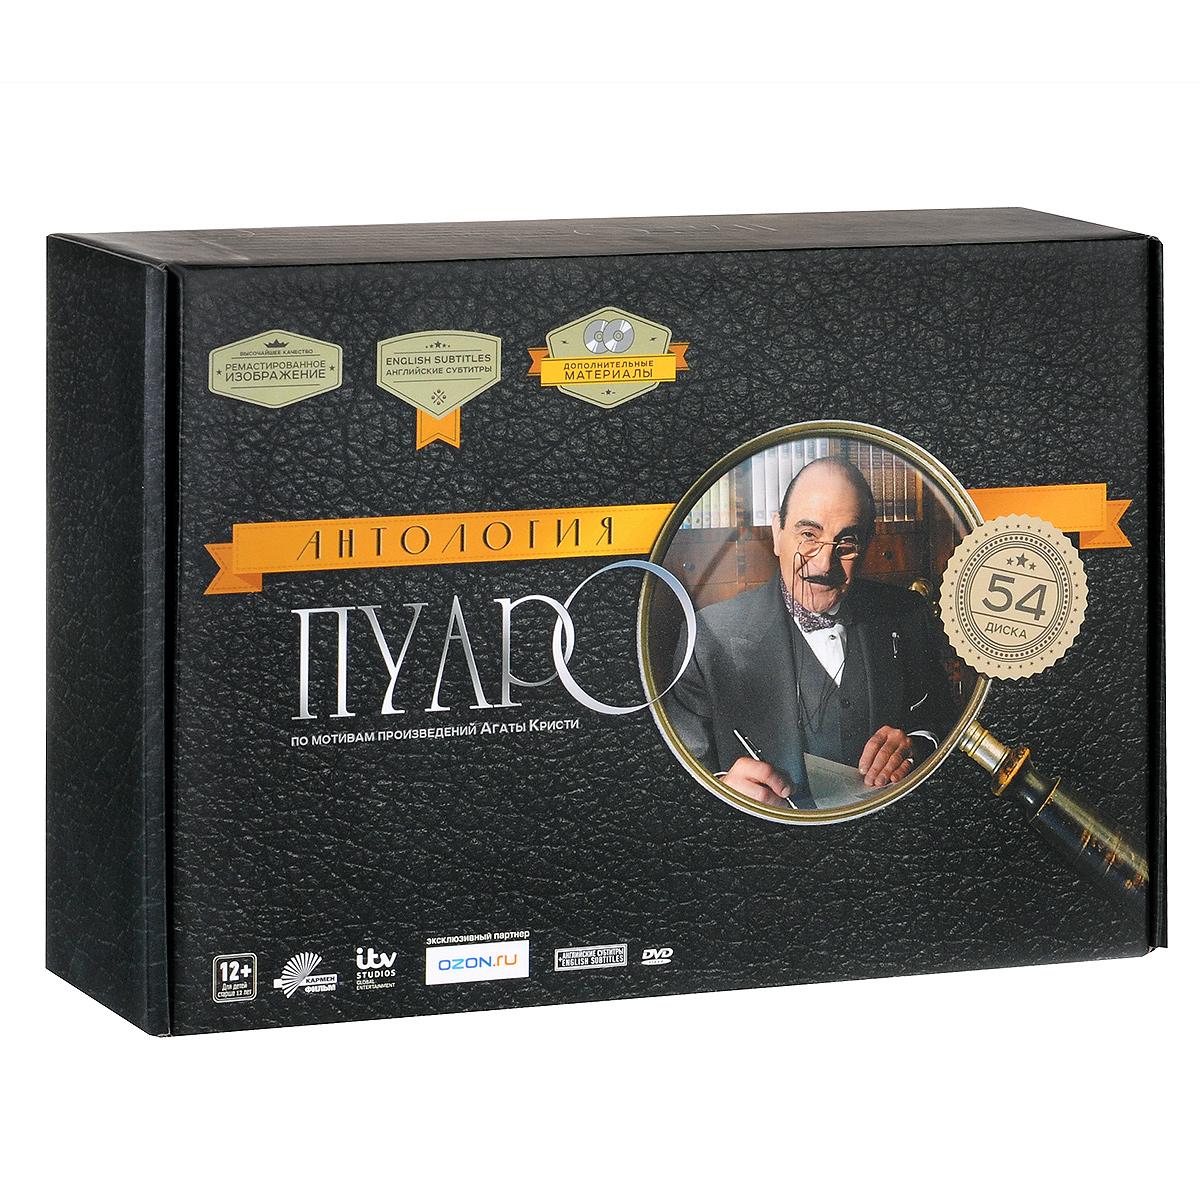 Пуаро: Полная коллекция (54 DVD)